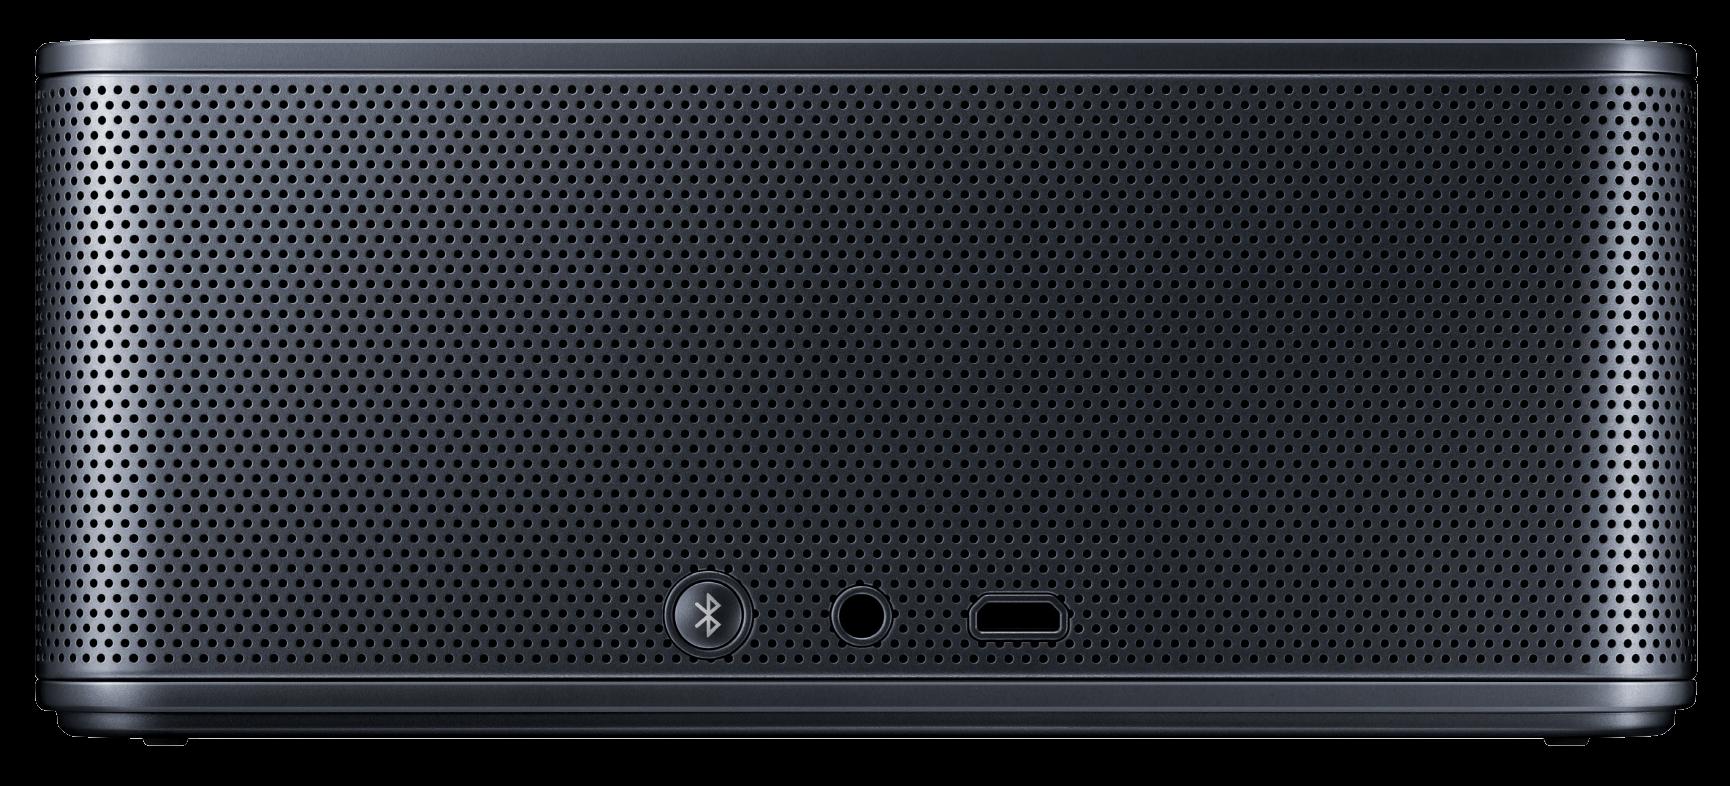 Портативная акустика Samsung EO-SG900DBEGRU Black - 3